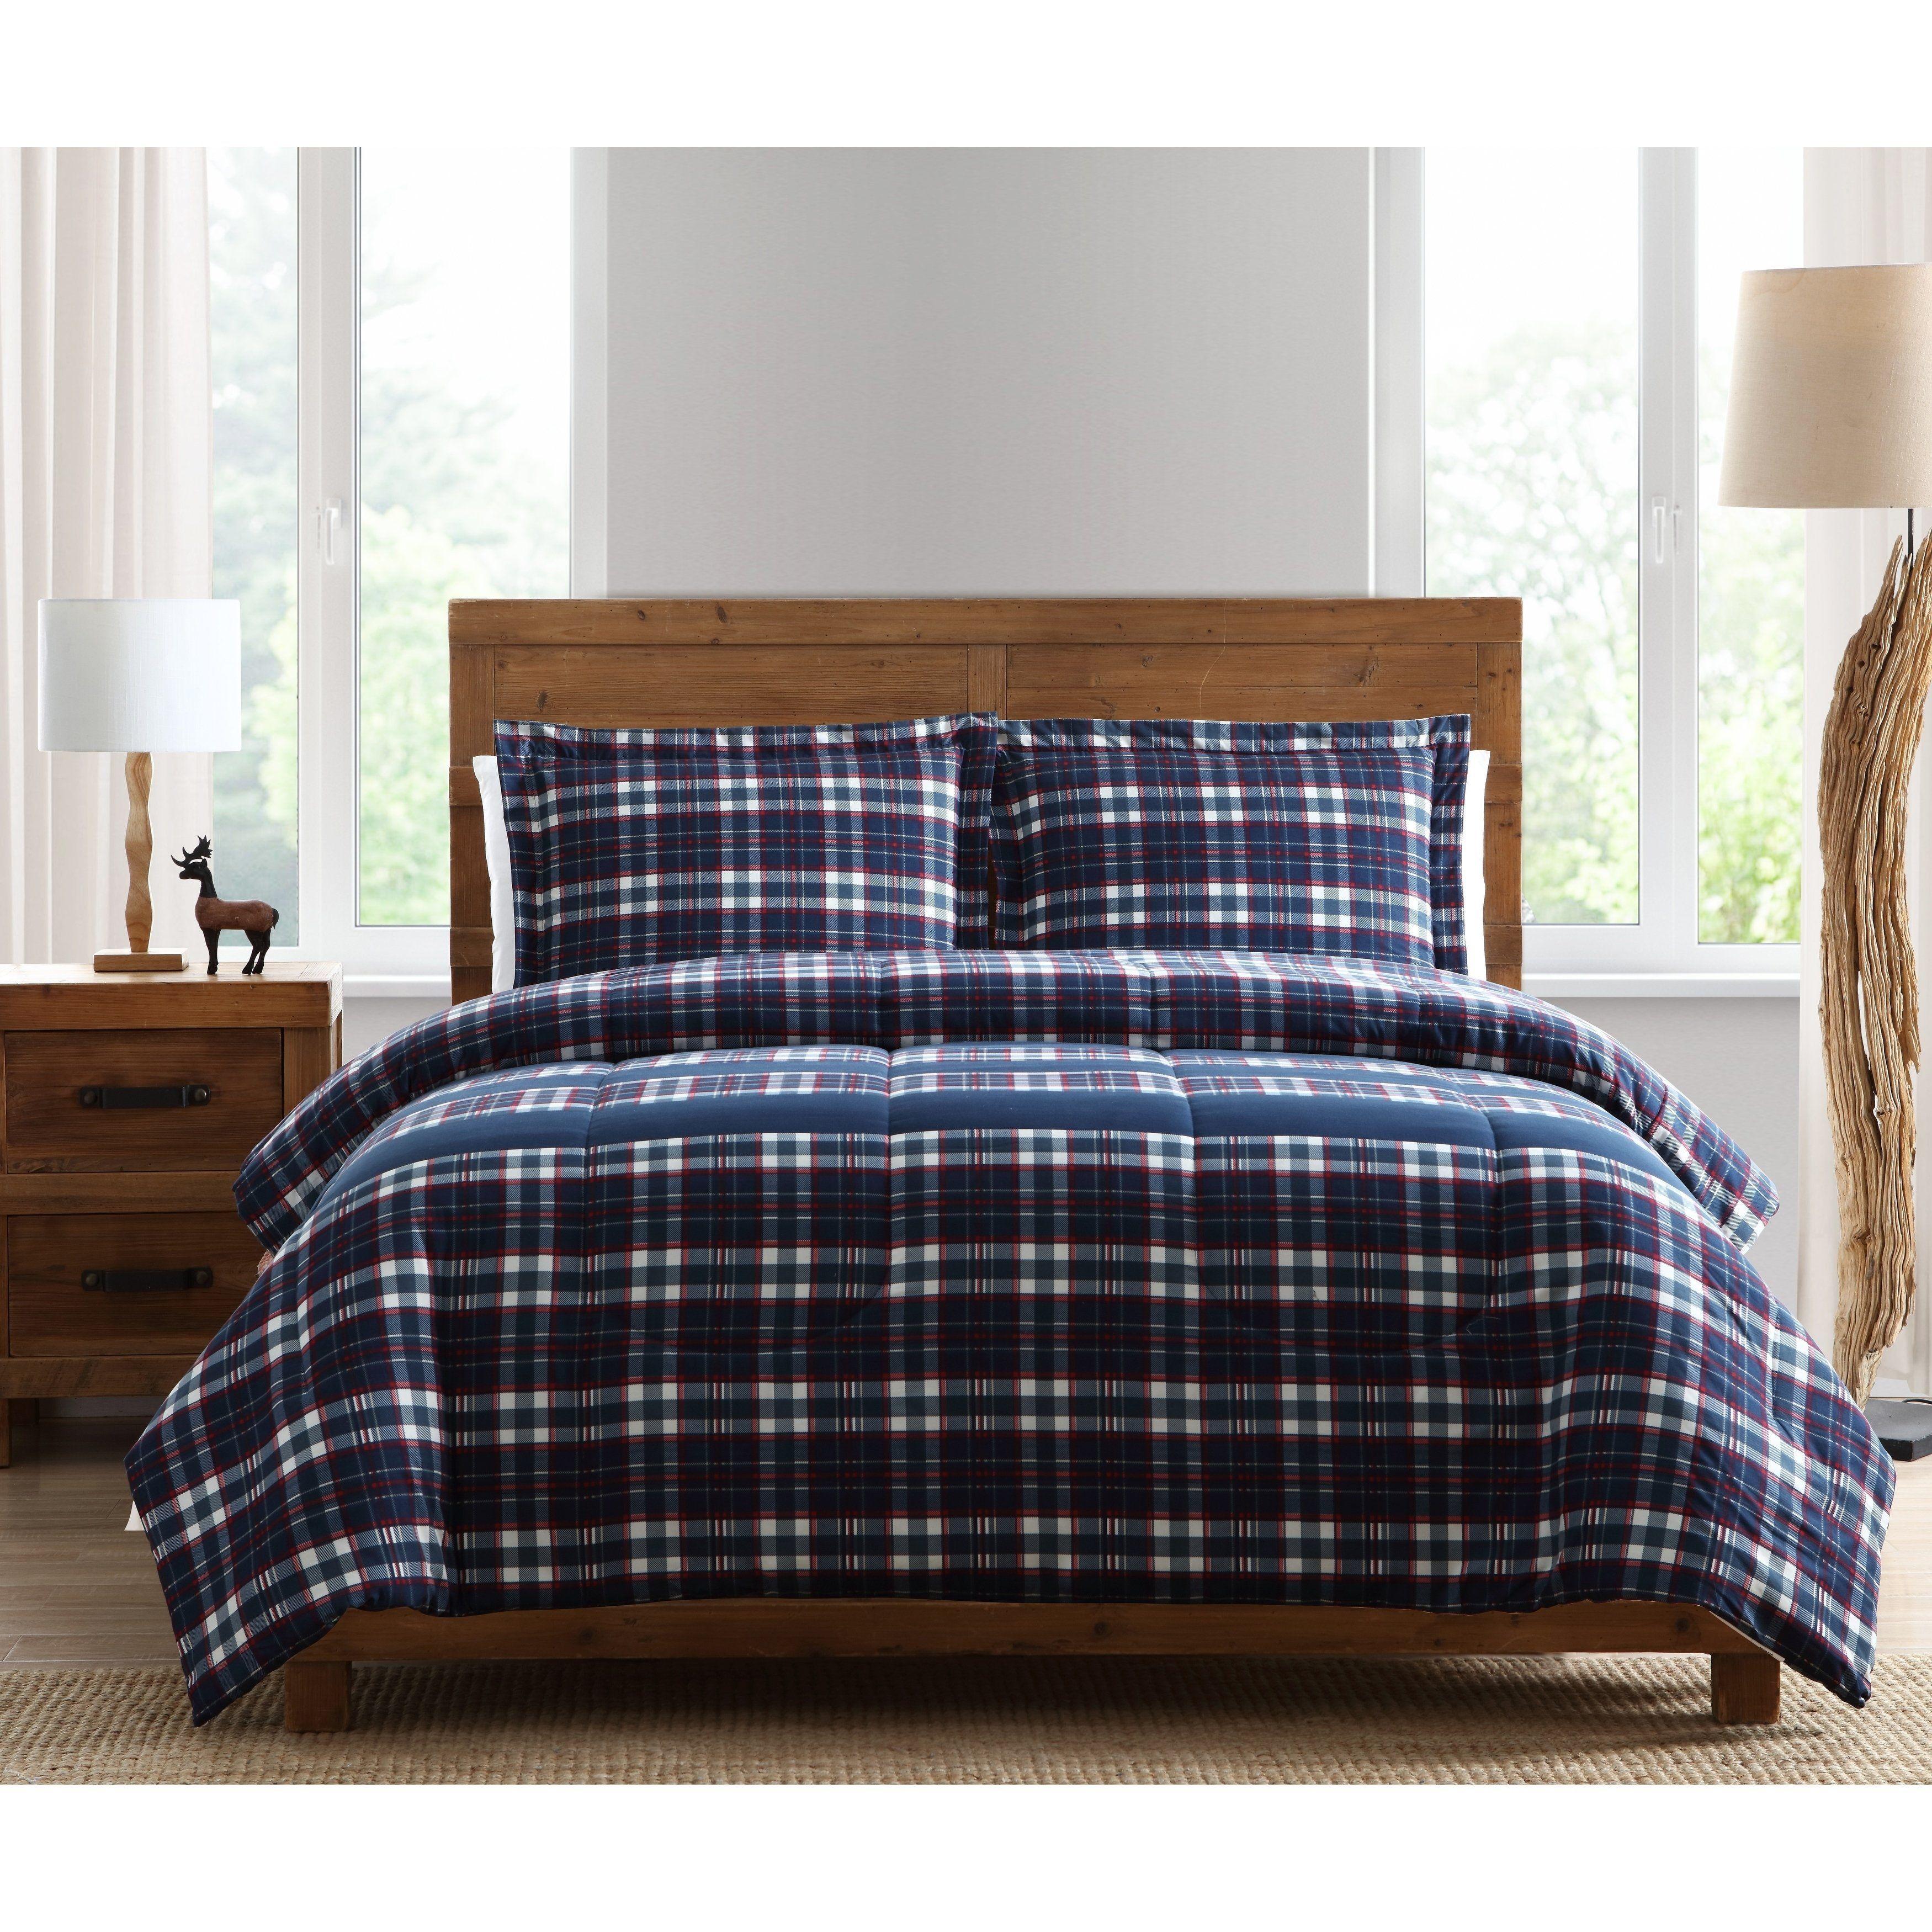 3 Piece Plaid Comforter Set Full Queen Blue Polyester Plaid Comforter Comforter Sets Bed Linens Luxury